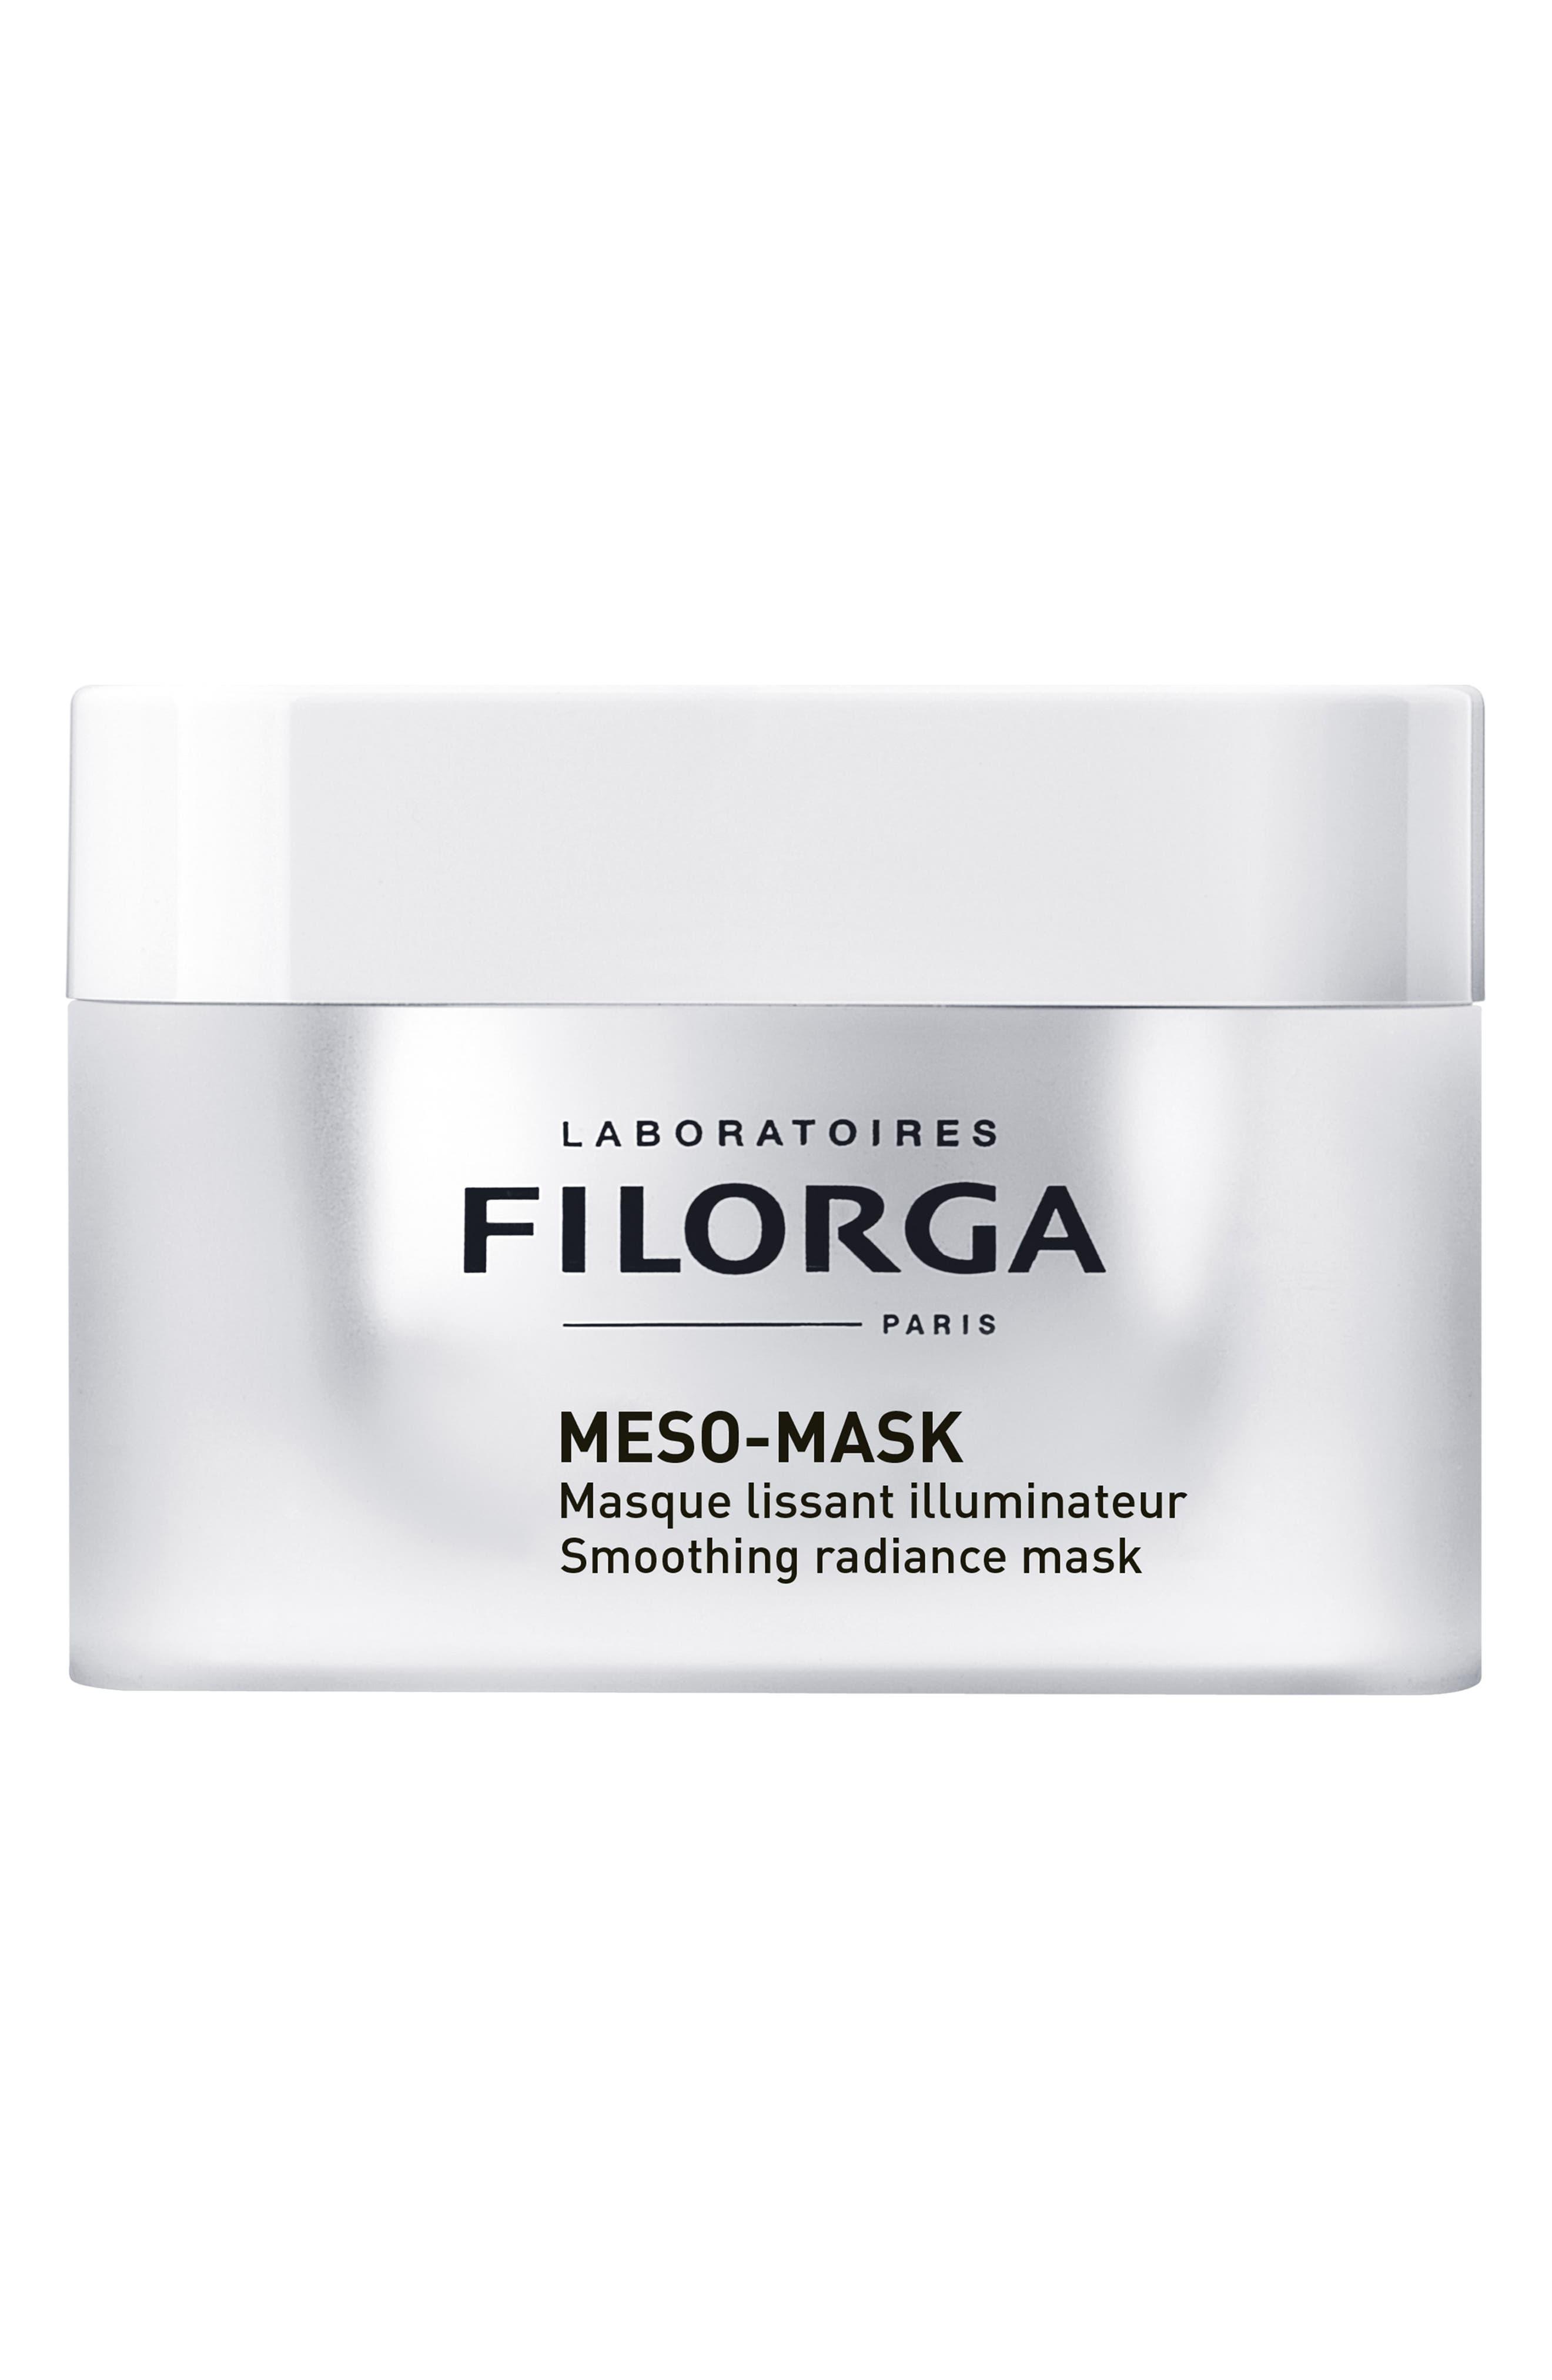 FILORGA, 'Meso-Mask' Anti-Wrinkle Lightening Mask, Main thumbnail 1, color, NO COLOR